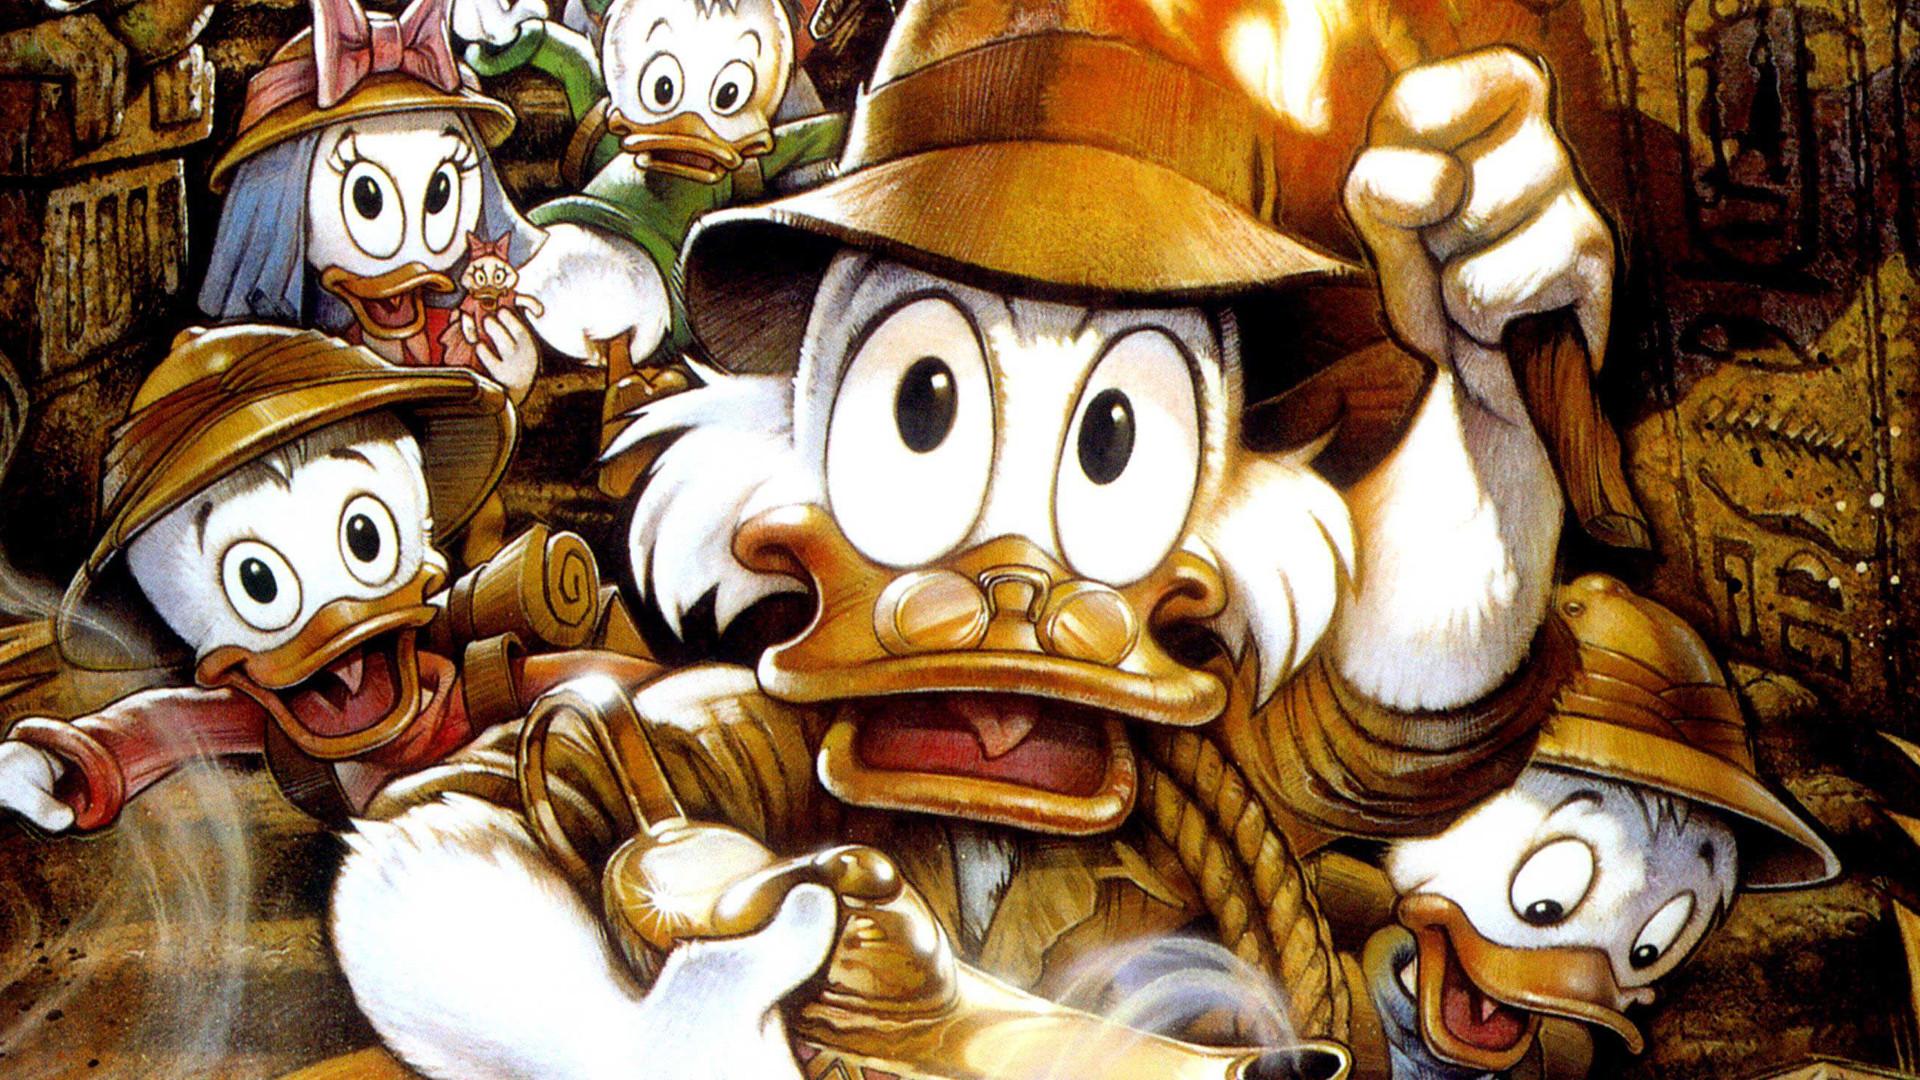 ducktales the movie treasure of the lost lamp movie